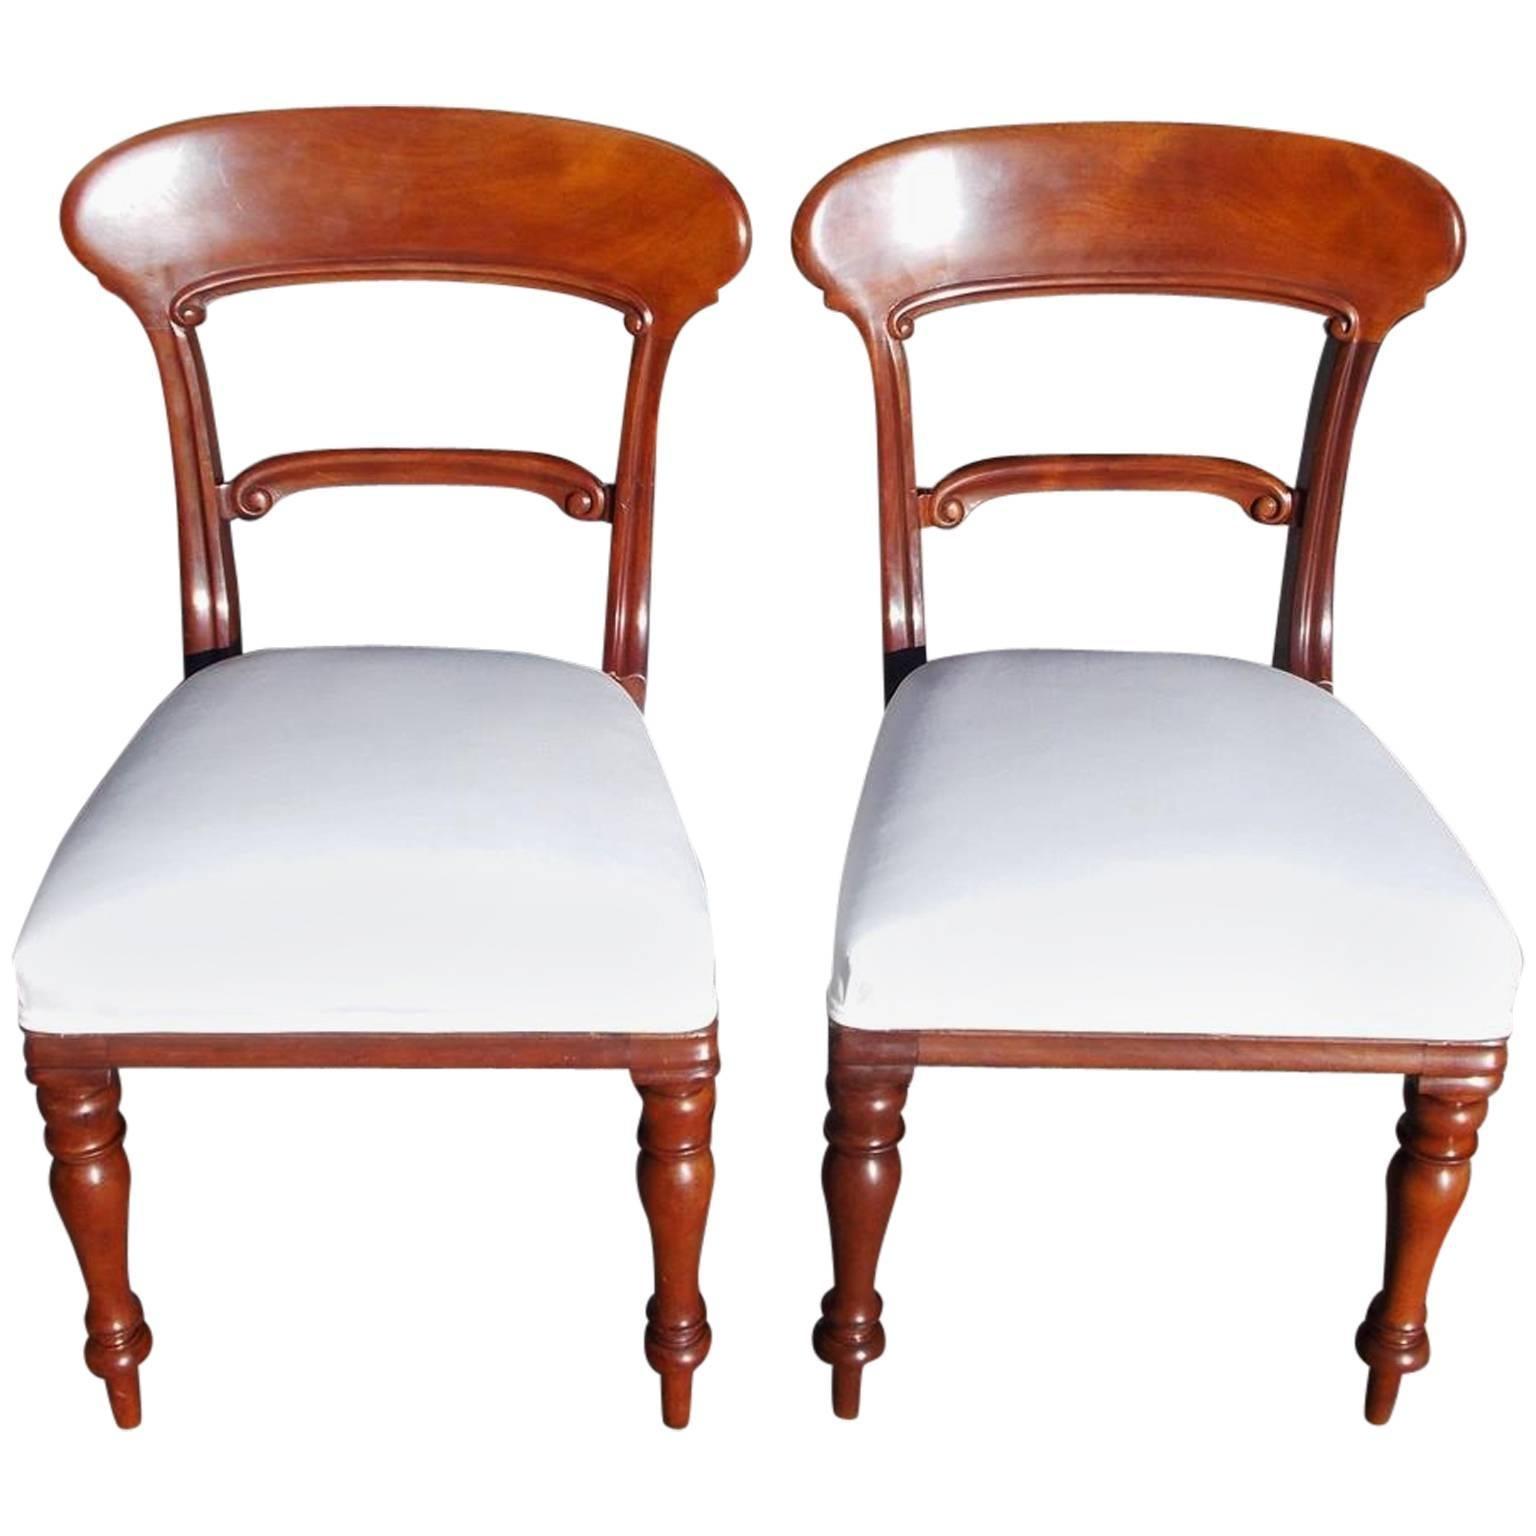 Pair of English Mahogany Regency Side Chairs, Circa 1820